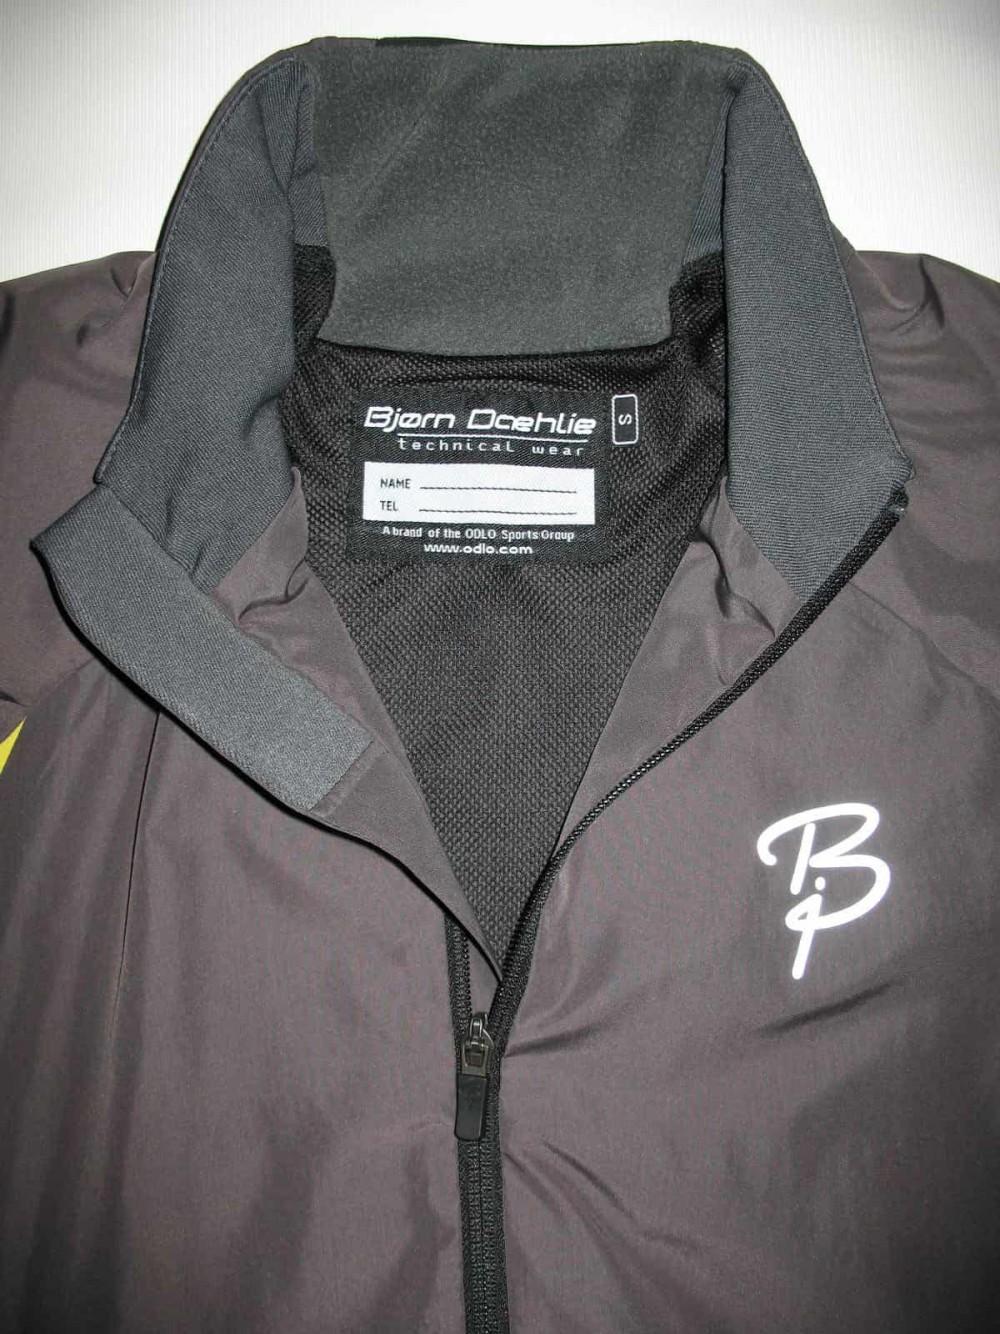 Куртка BJORN DAEHLIE by ODLO logic windproof jacket (размер S/M) - 4